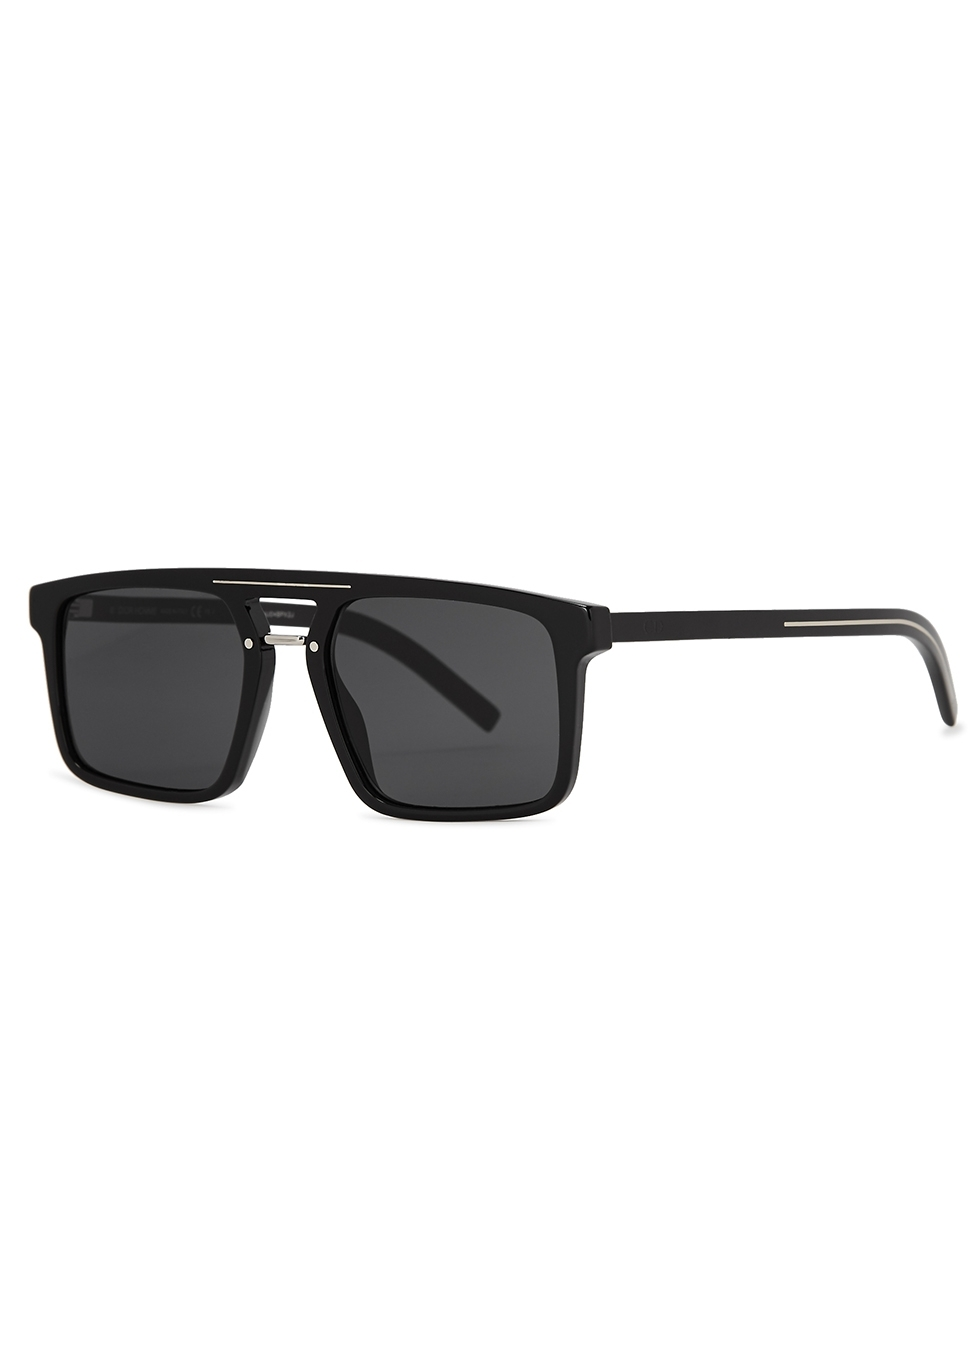 22287e4a1bd Men s Designer Sunglasses   Eyewear - Harvey Nichols